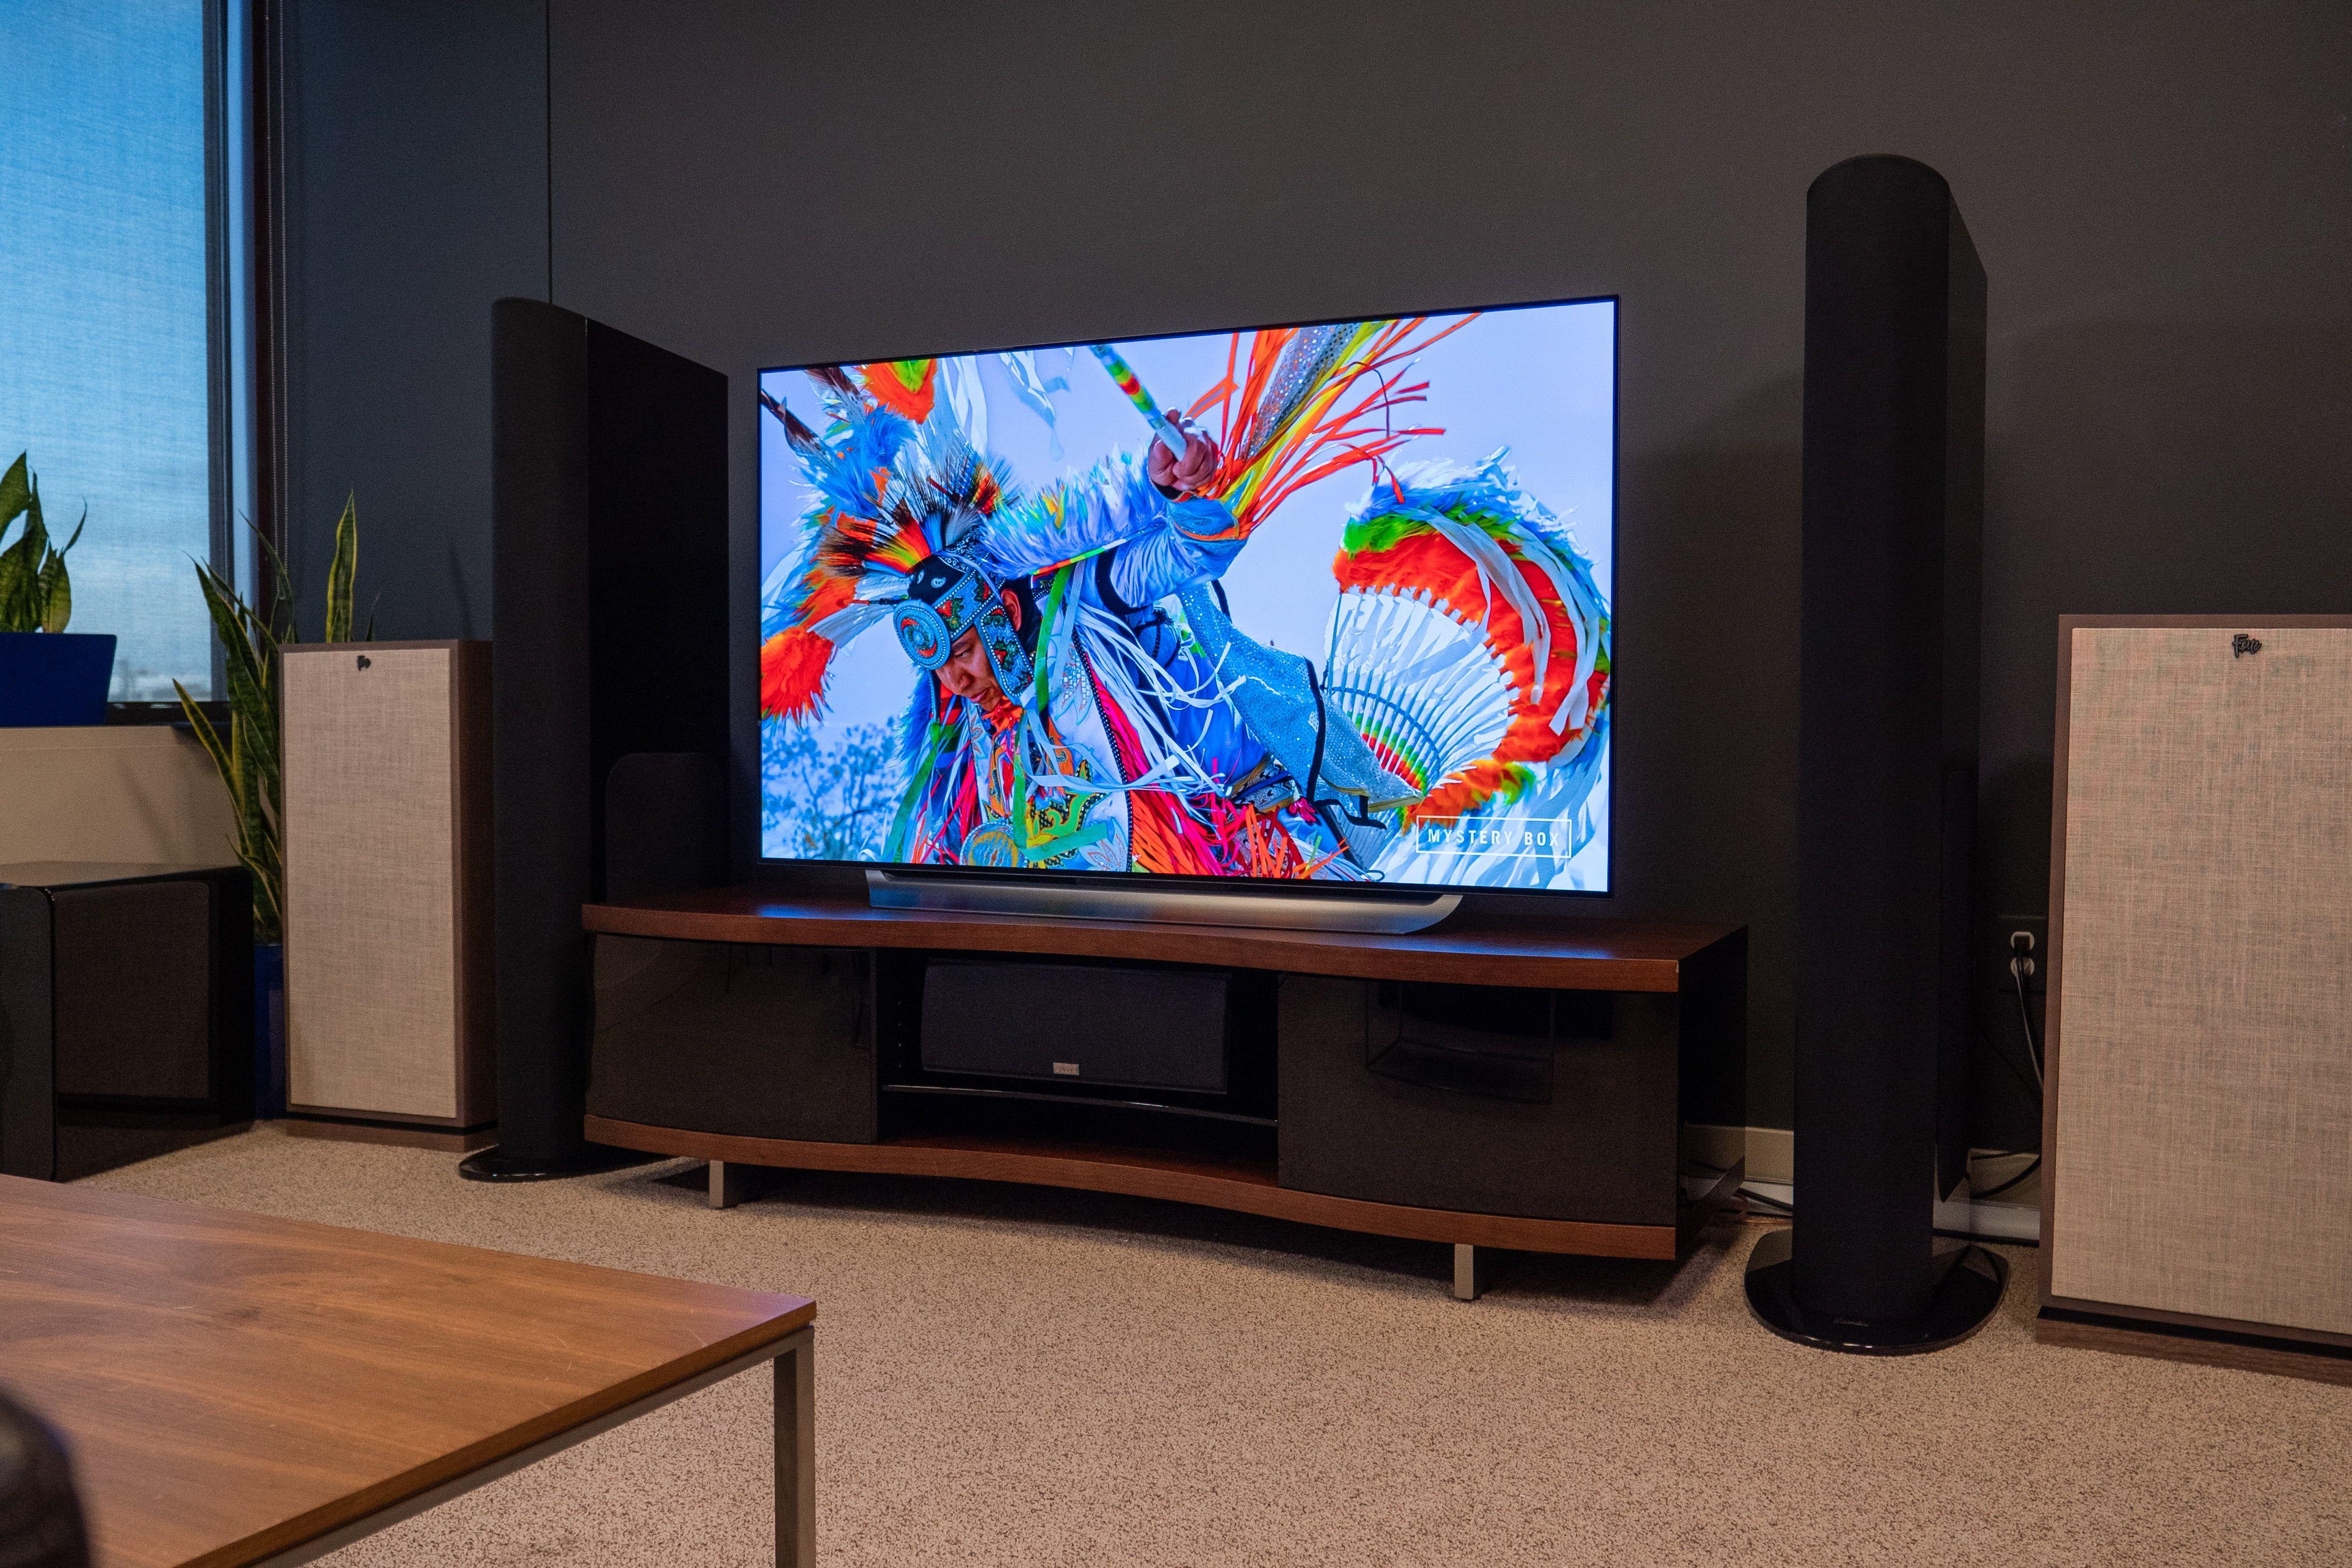 Best Black Friday Tv Deals 2020 Hdtvs 4k Tvs 8k Tvs Digital Trends 4k Tv Black Friday Tv Deals Smart Tv